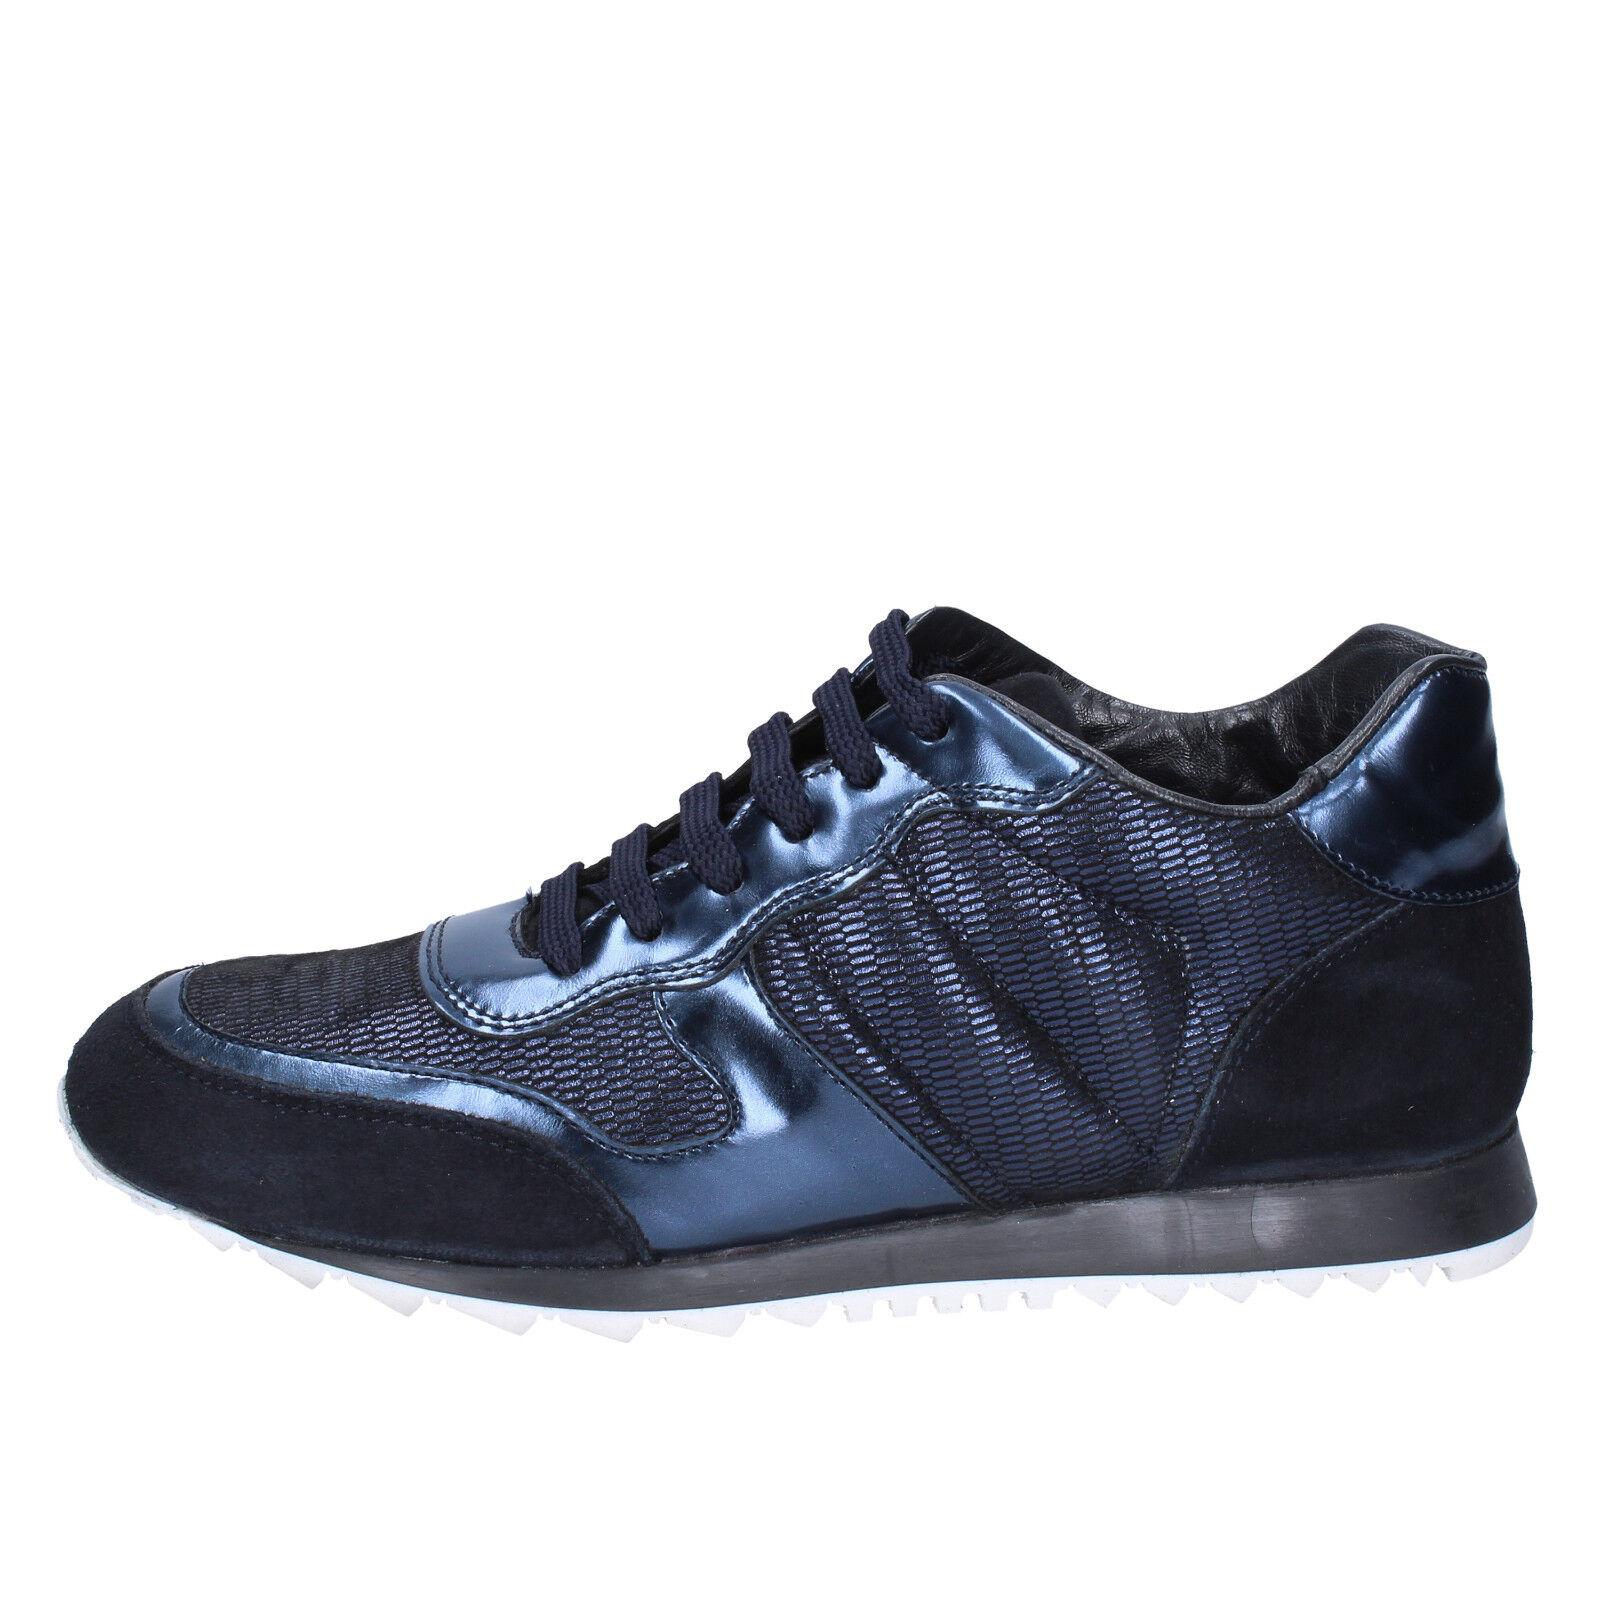 Damen schuhe TRIVER FLIGHT 41 EU sneakers blau leder wildleder BX577-41